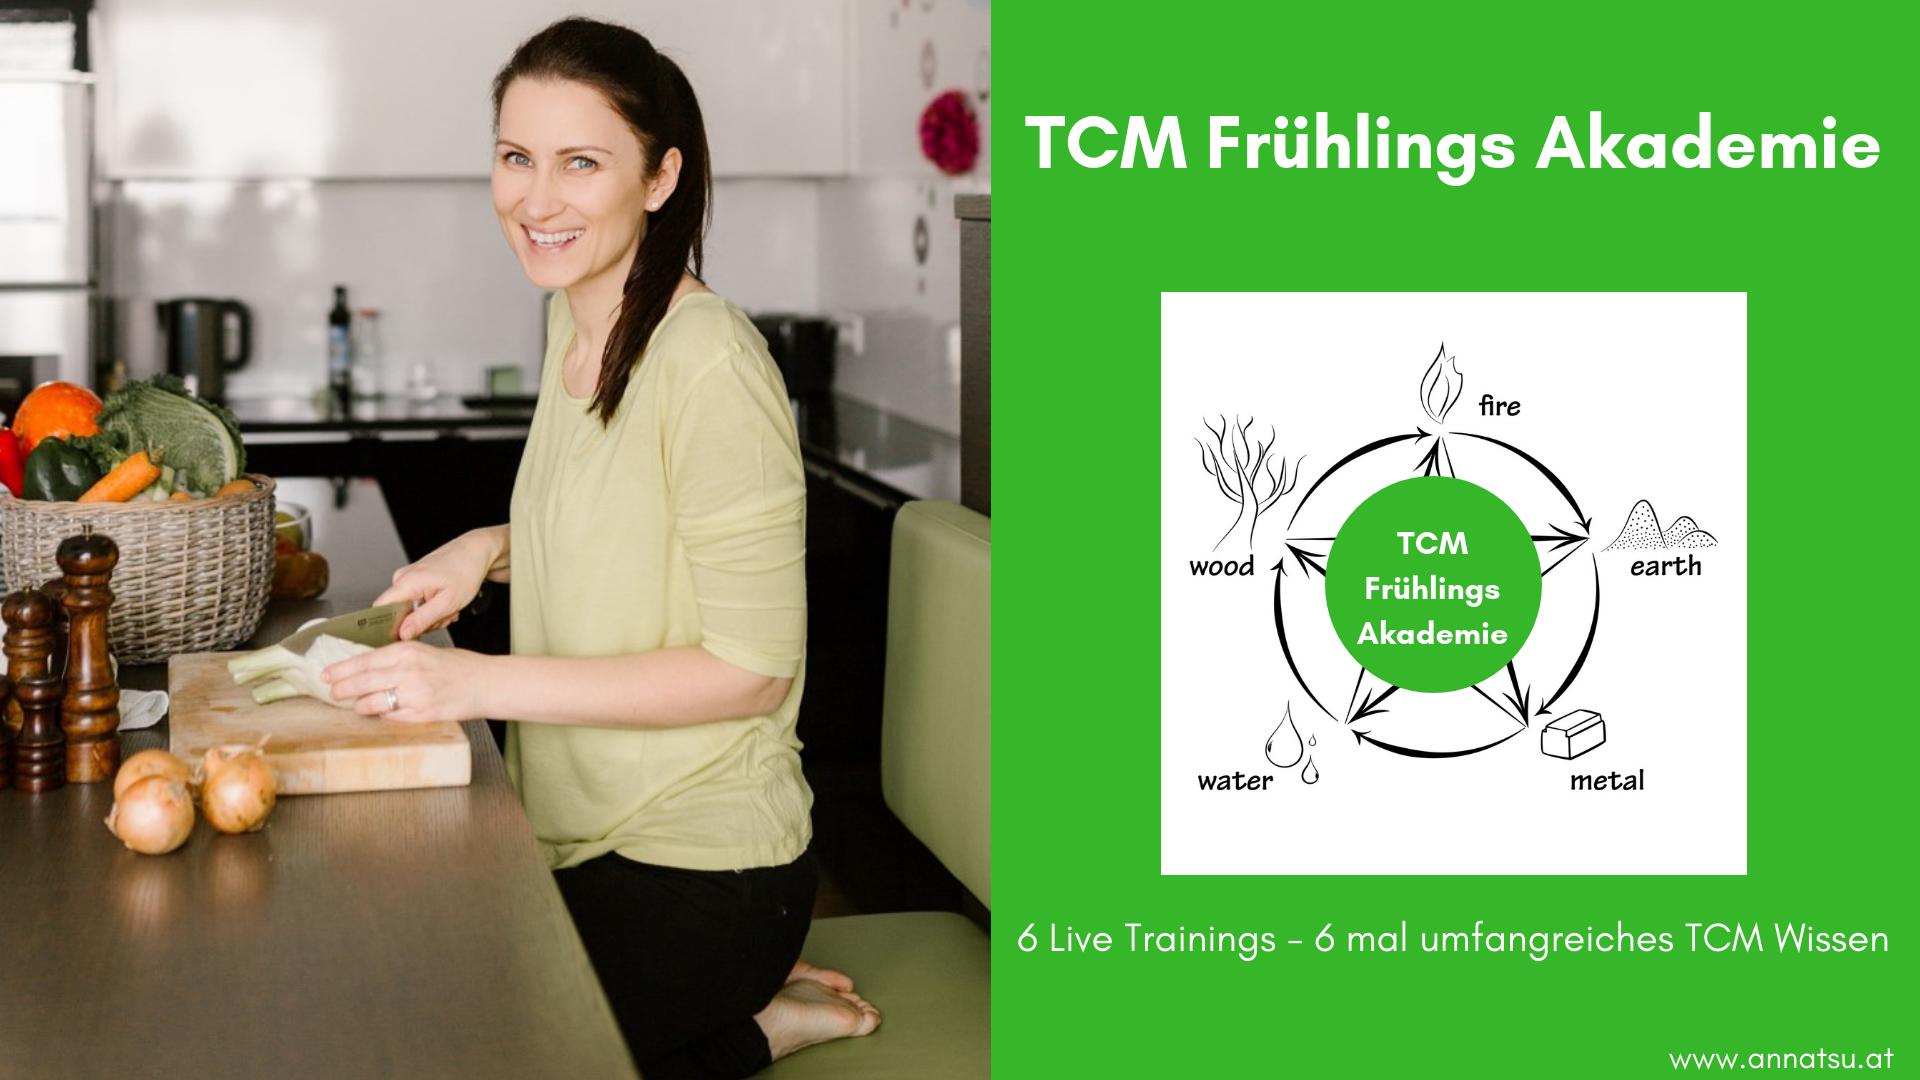 TCM Frühlings Akademie - TCM Ernährung - 5 Elemente - Yin und Yang - Ernährungsberatung - fb Event - Anna Reschreiter - foodblog - annatsu